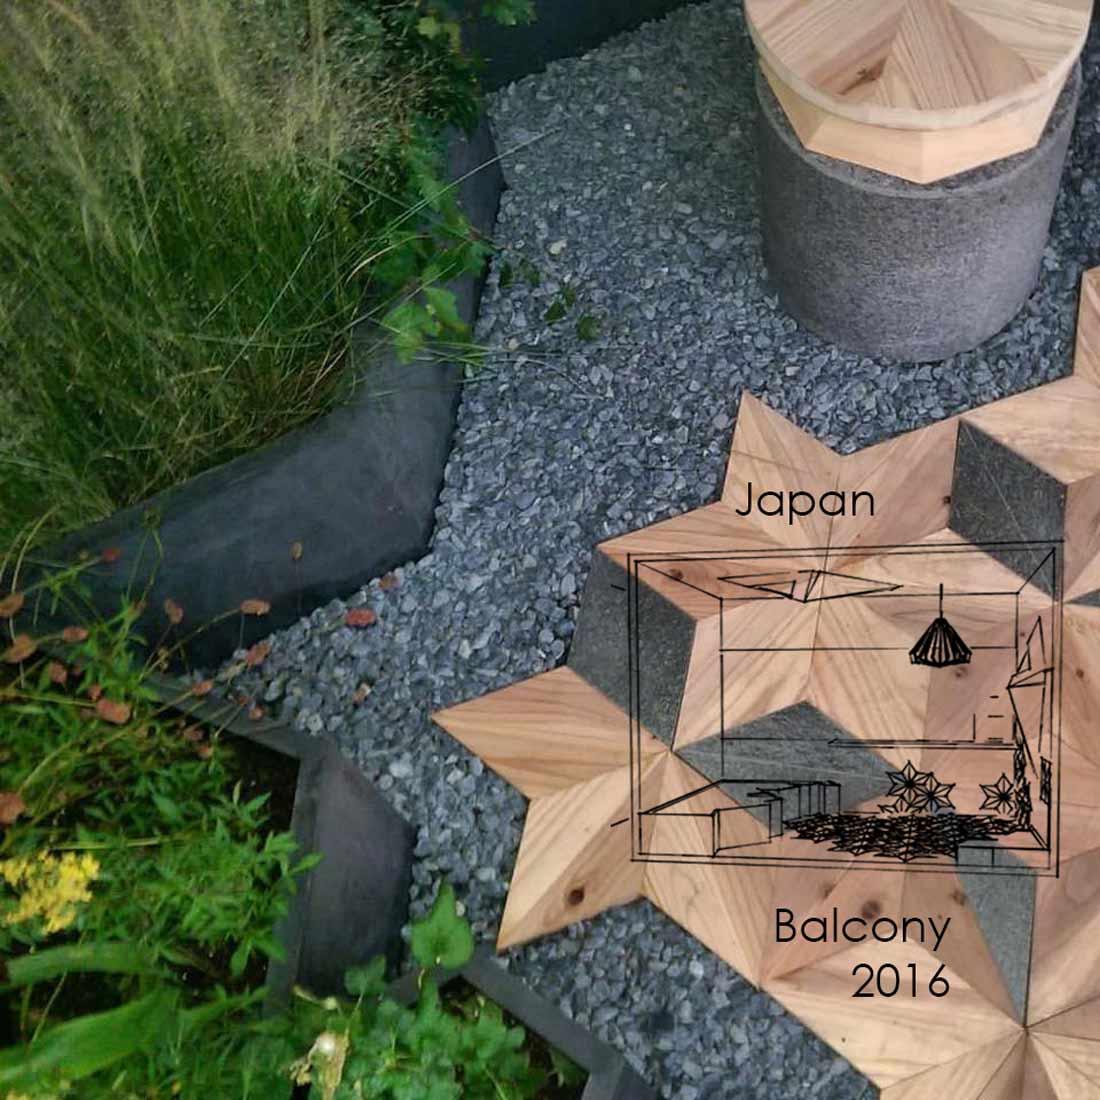 japanbalcony2.jpg